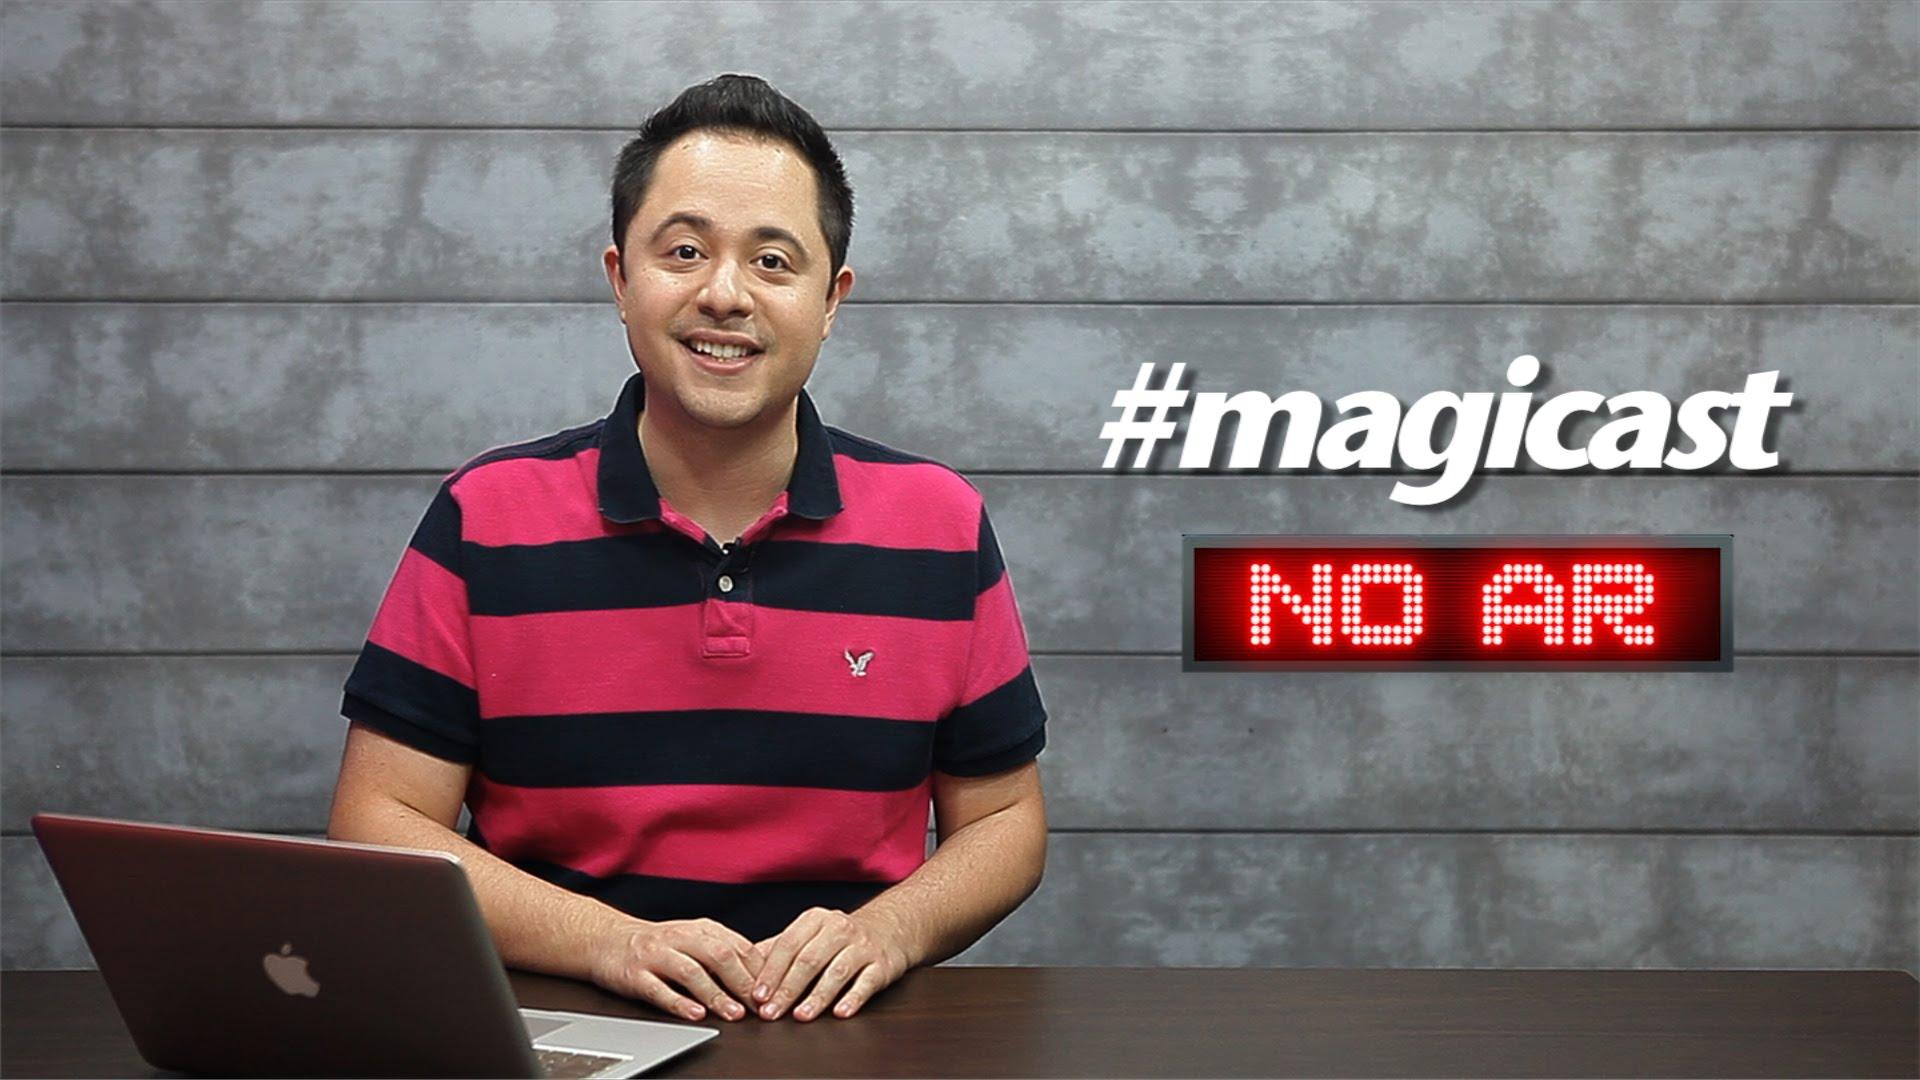 #magicast #02 com Léo Otsuka – Estamos de volta!